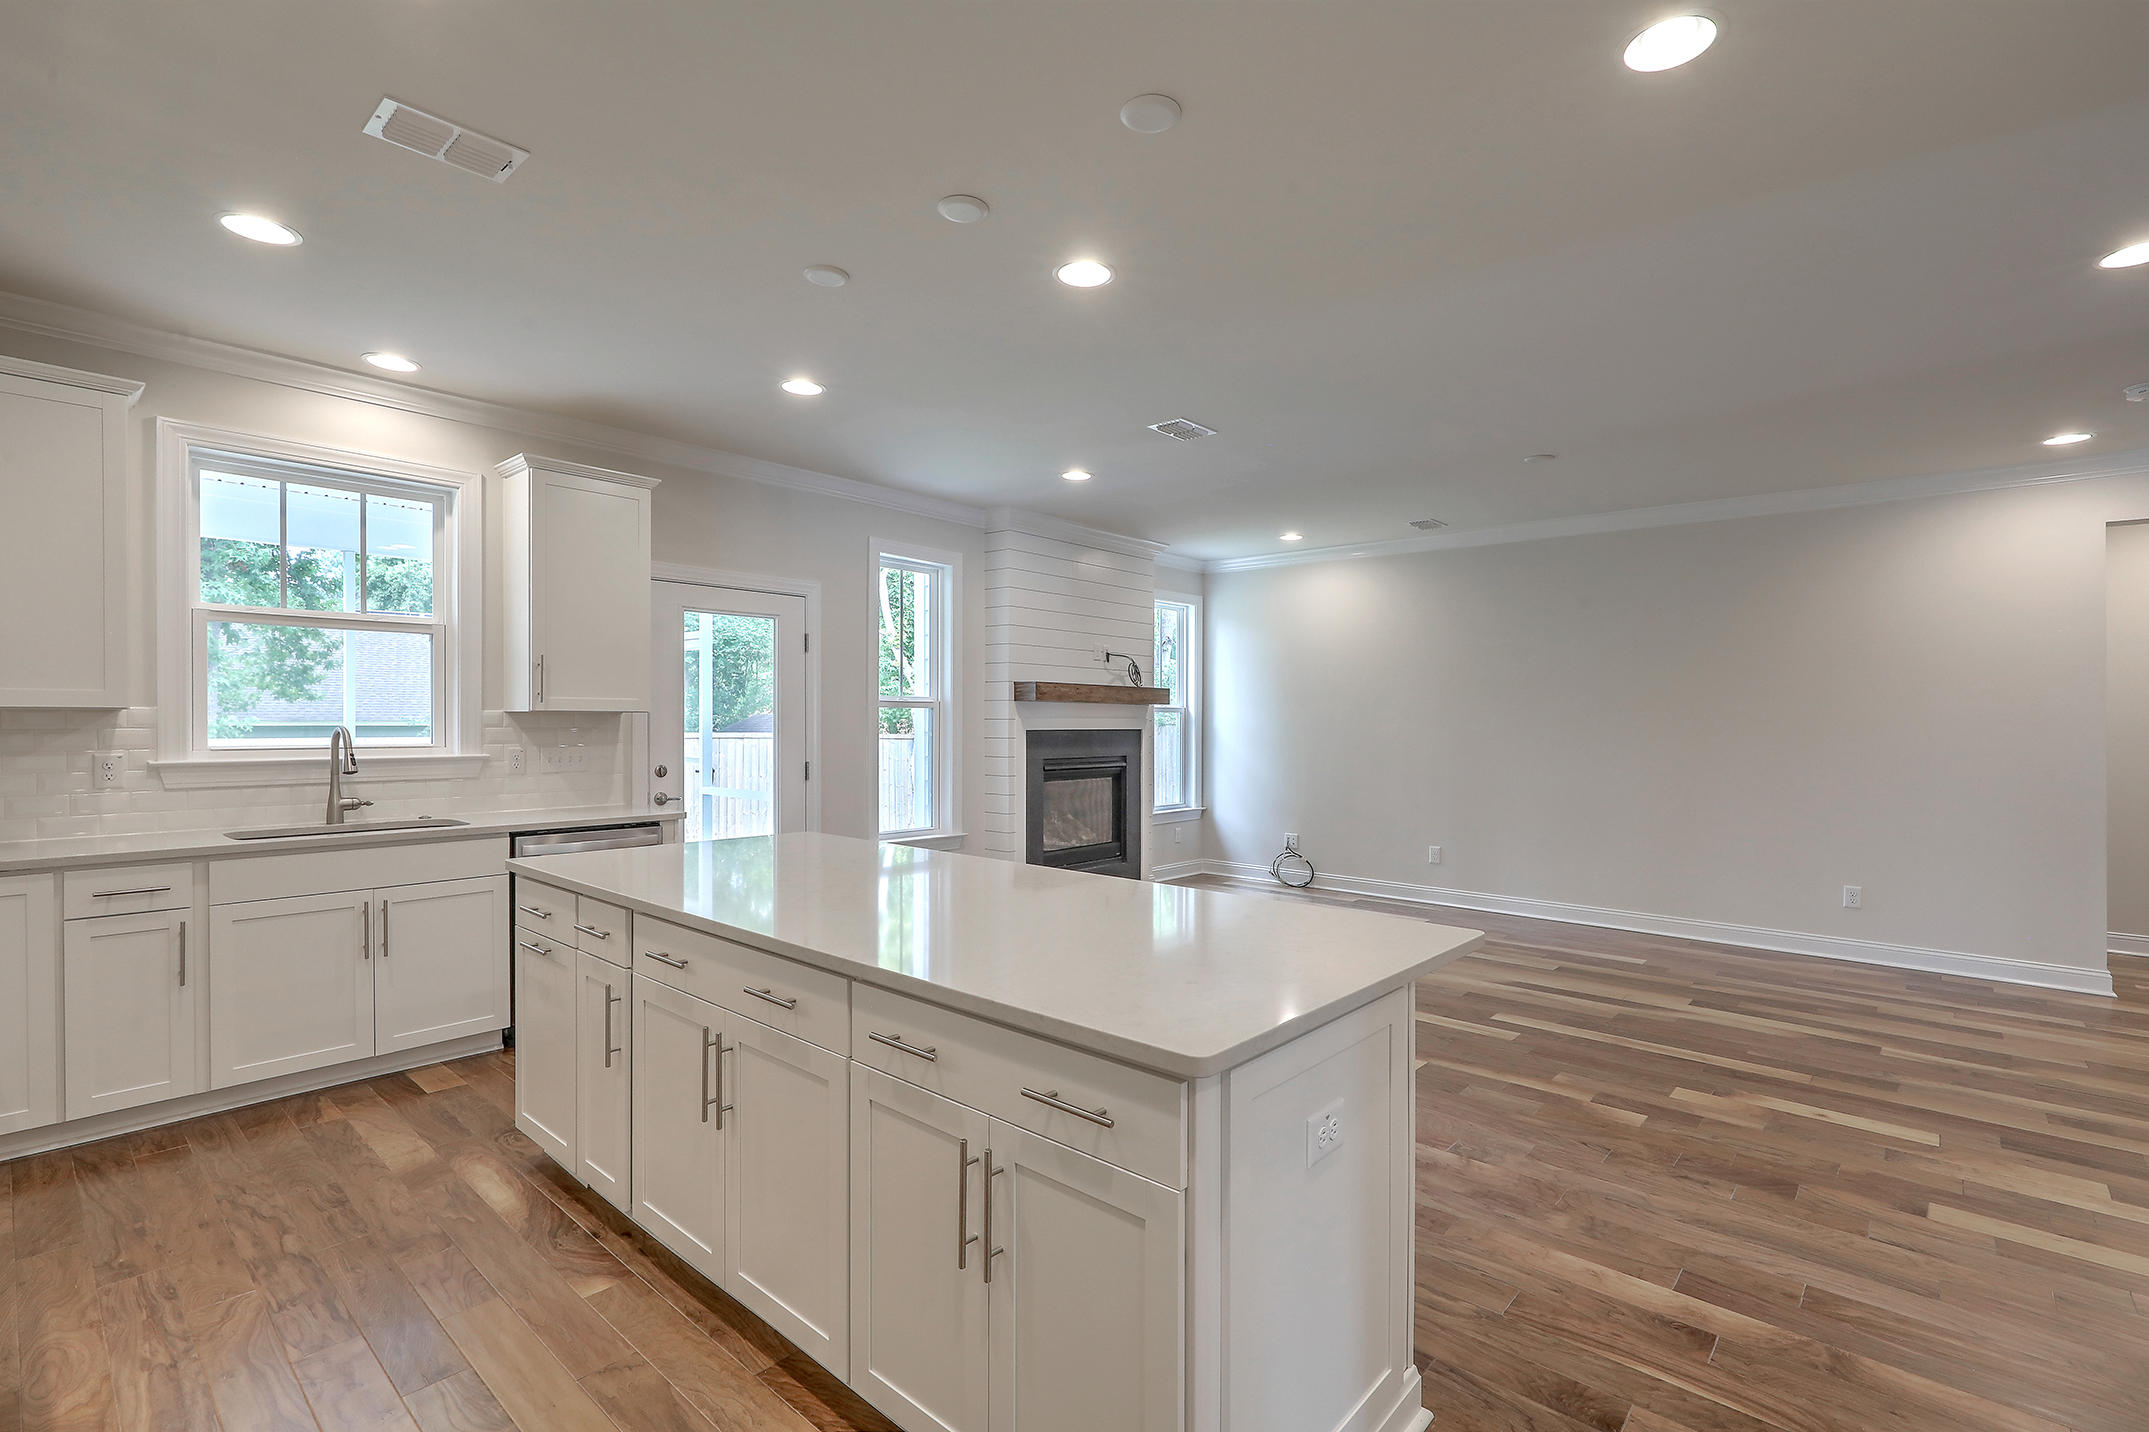 Bentley Park Homes For Sale - 1277 Gannett, Mount Pleasant, SC - 19